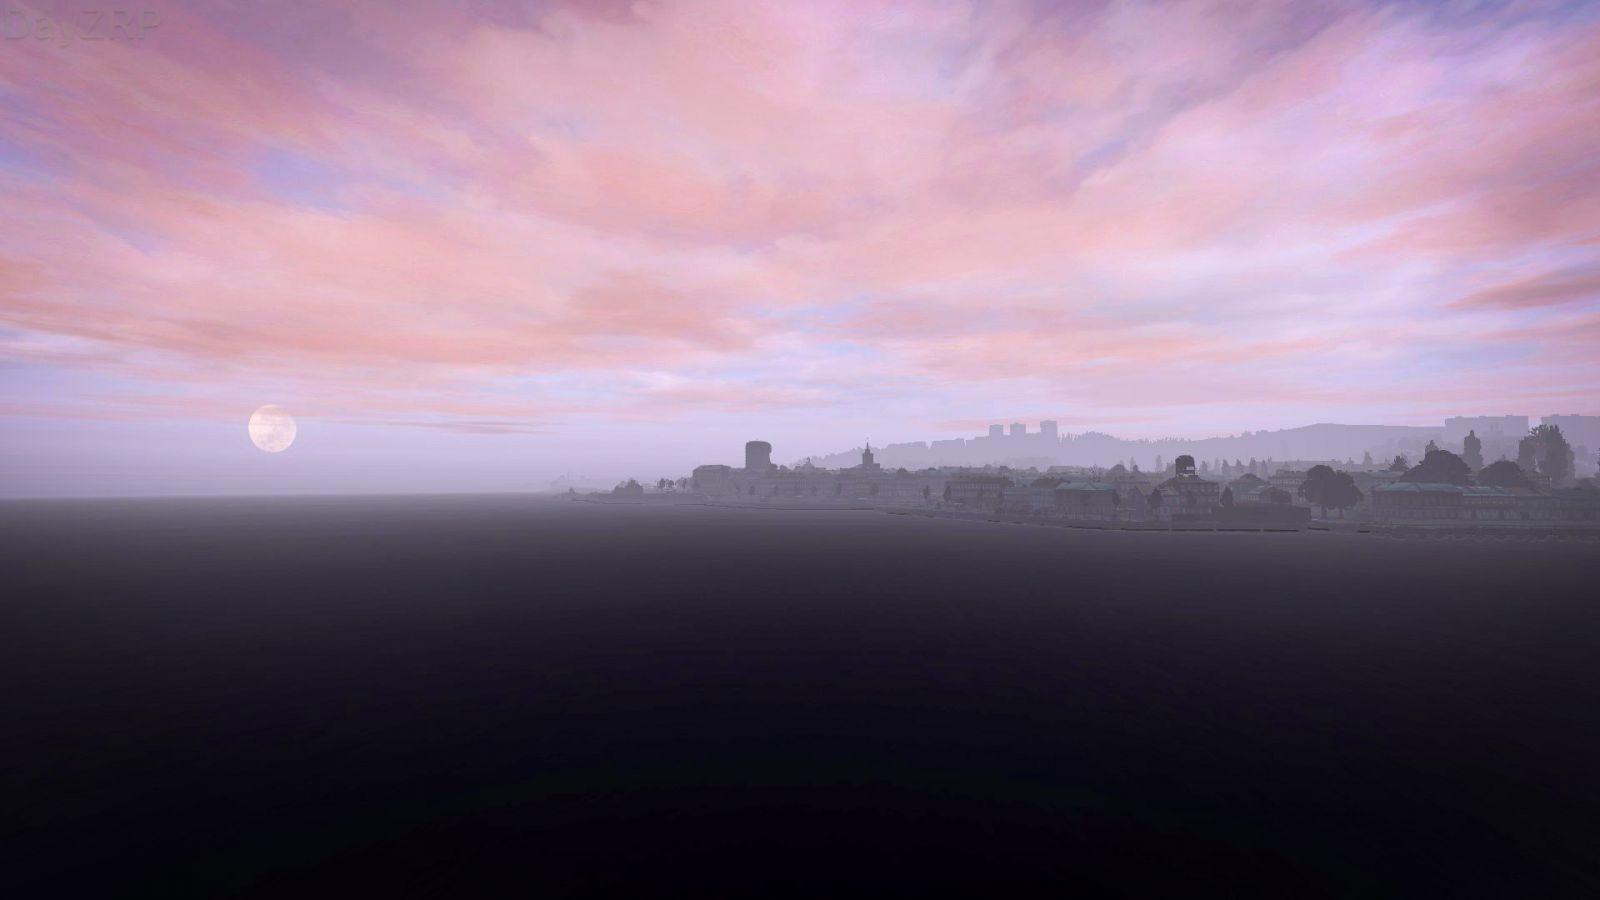 Dead City 2.0